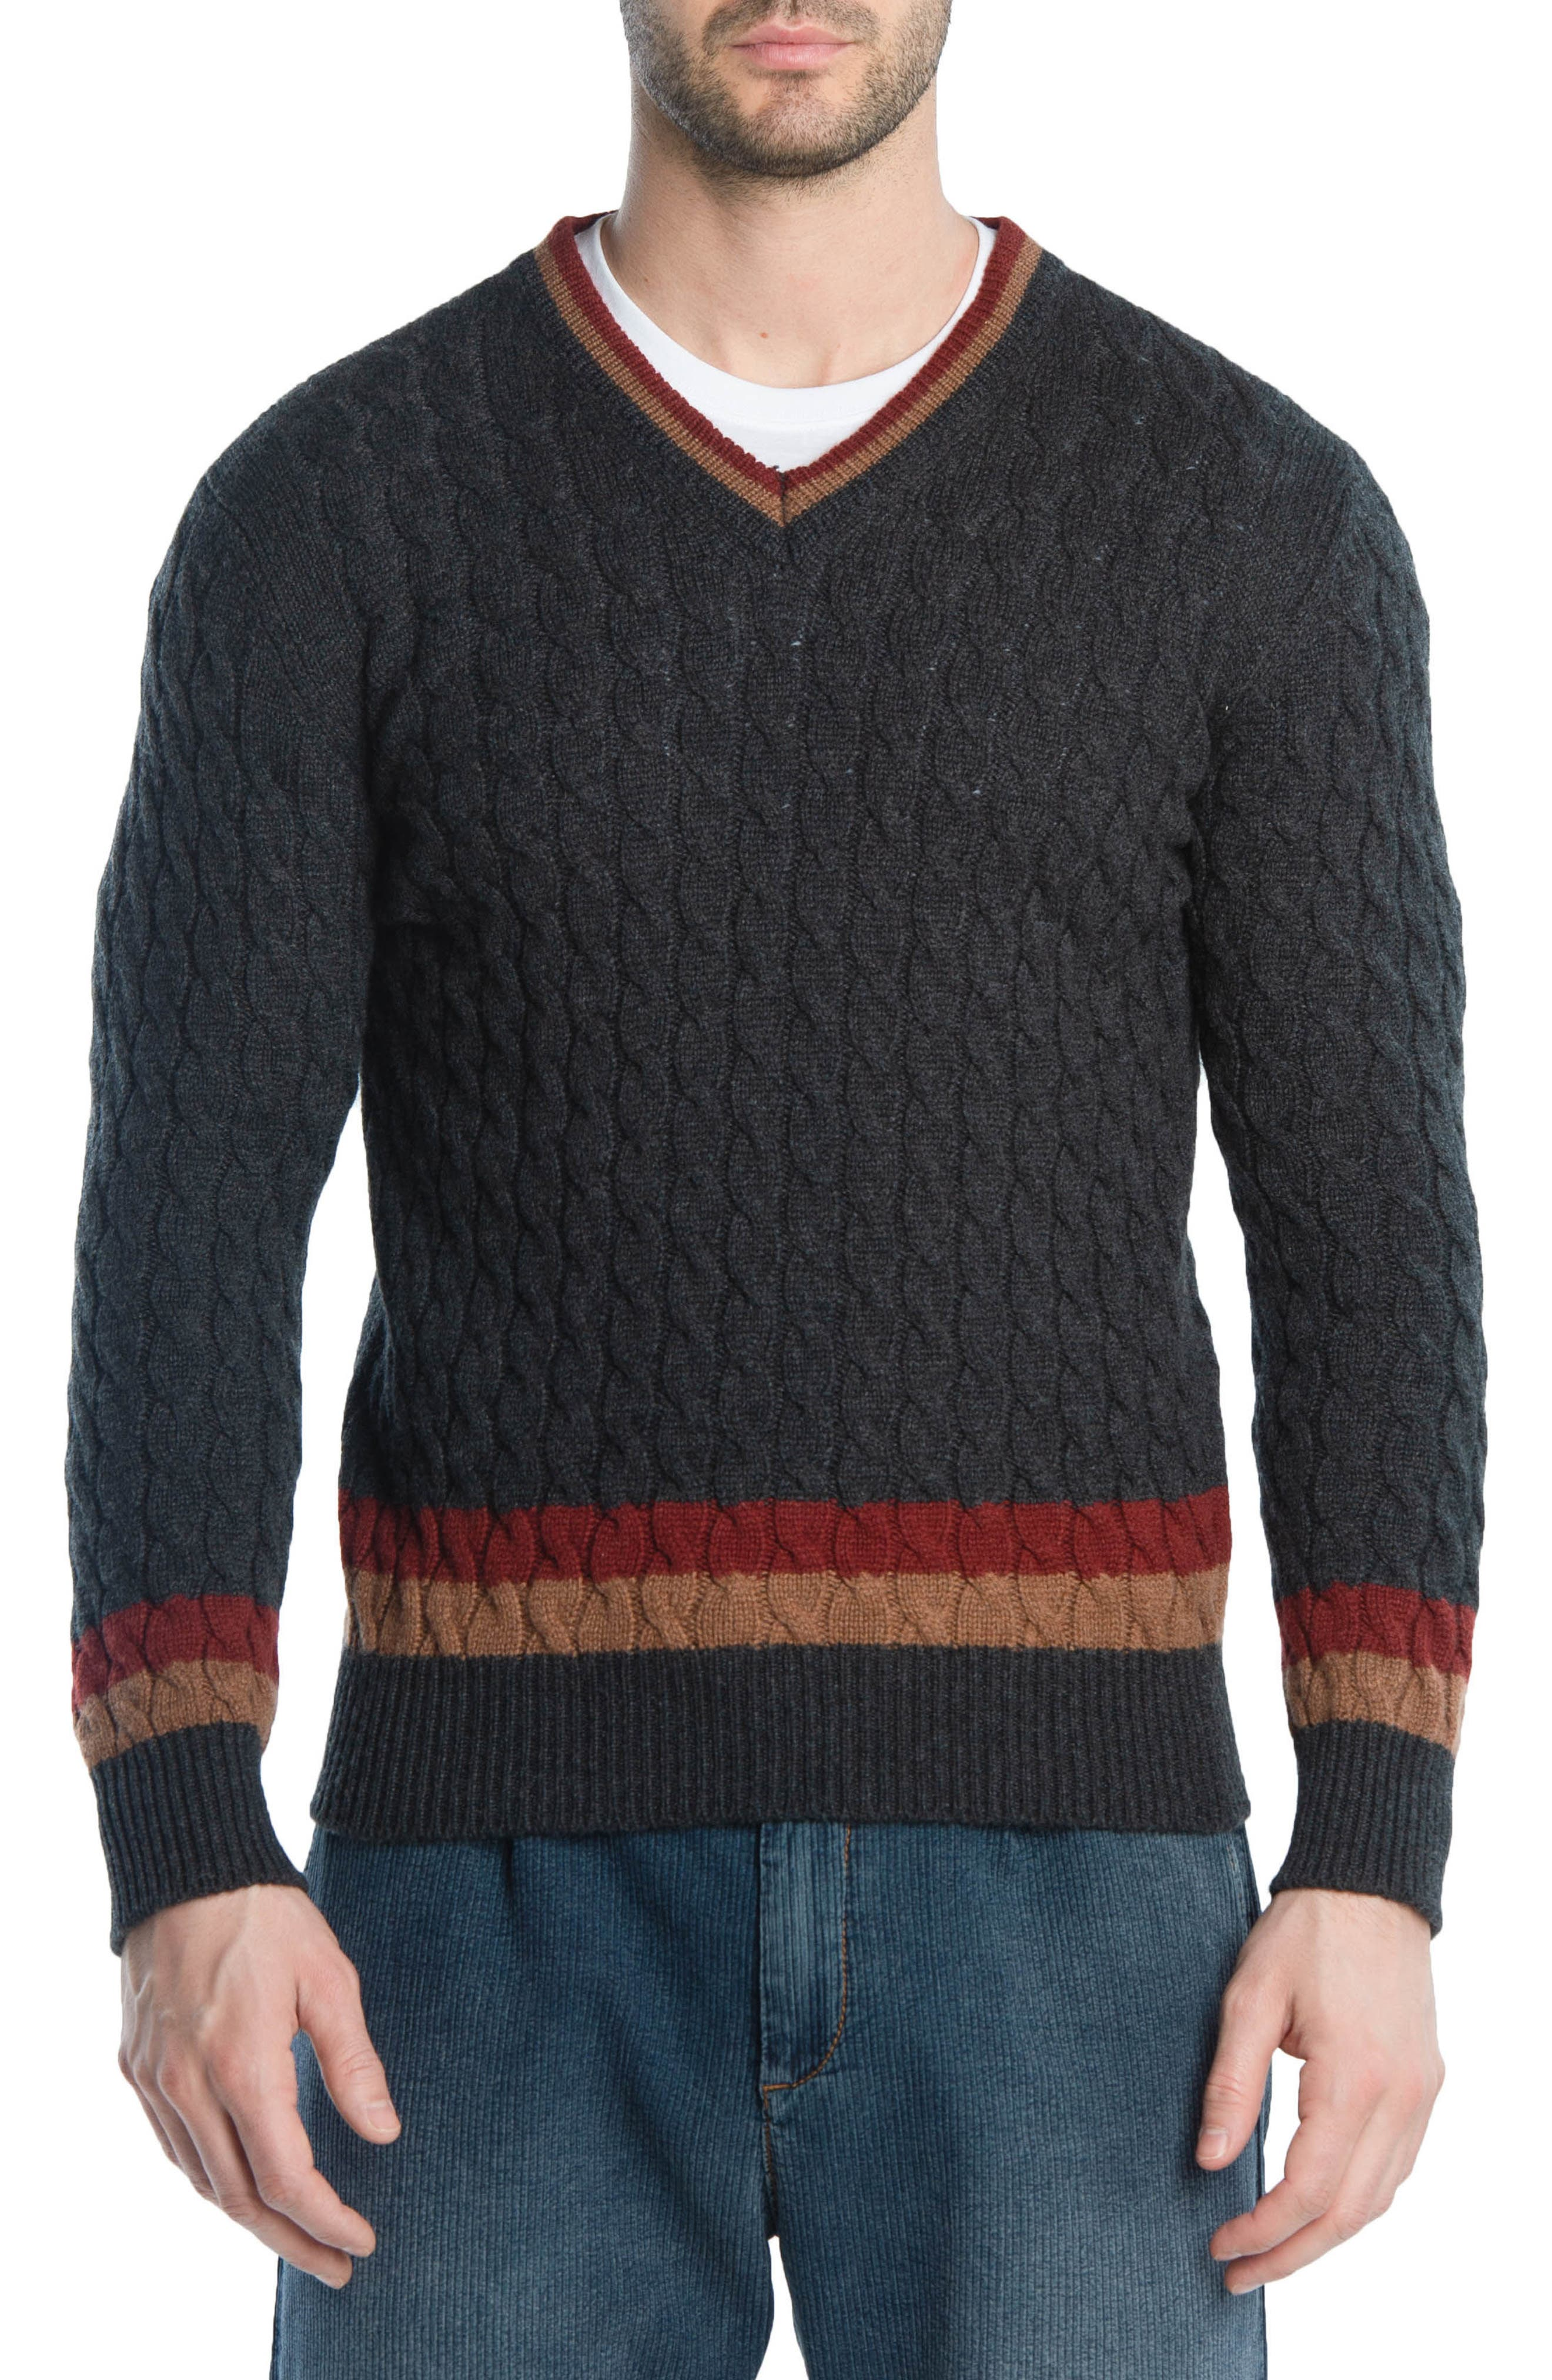 Cableknit Cashmere V-Neck Sweater,                         Main,                         color, DARK GREY